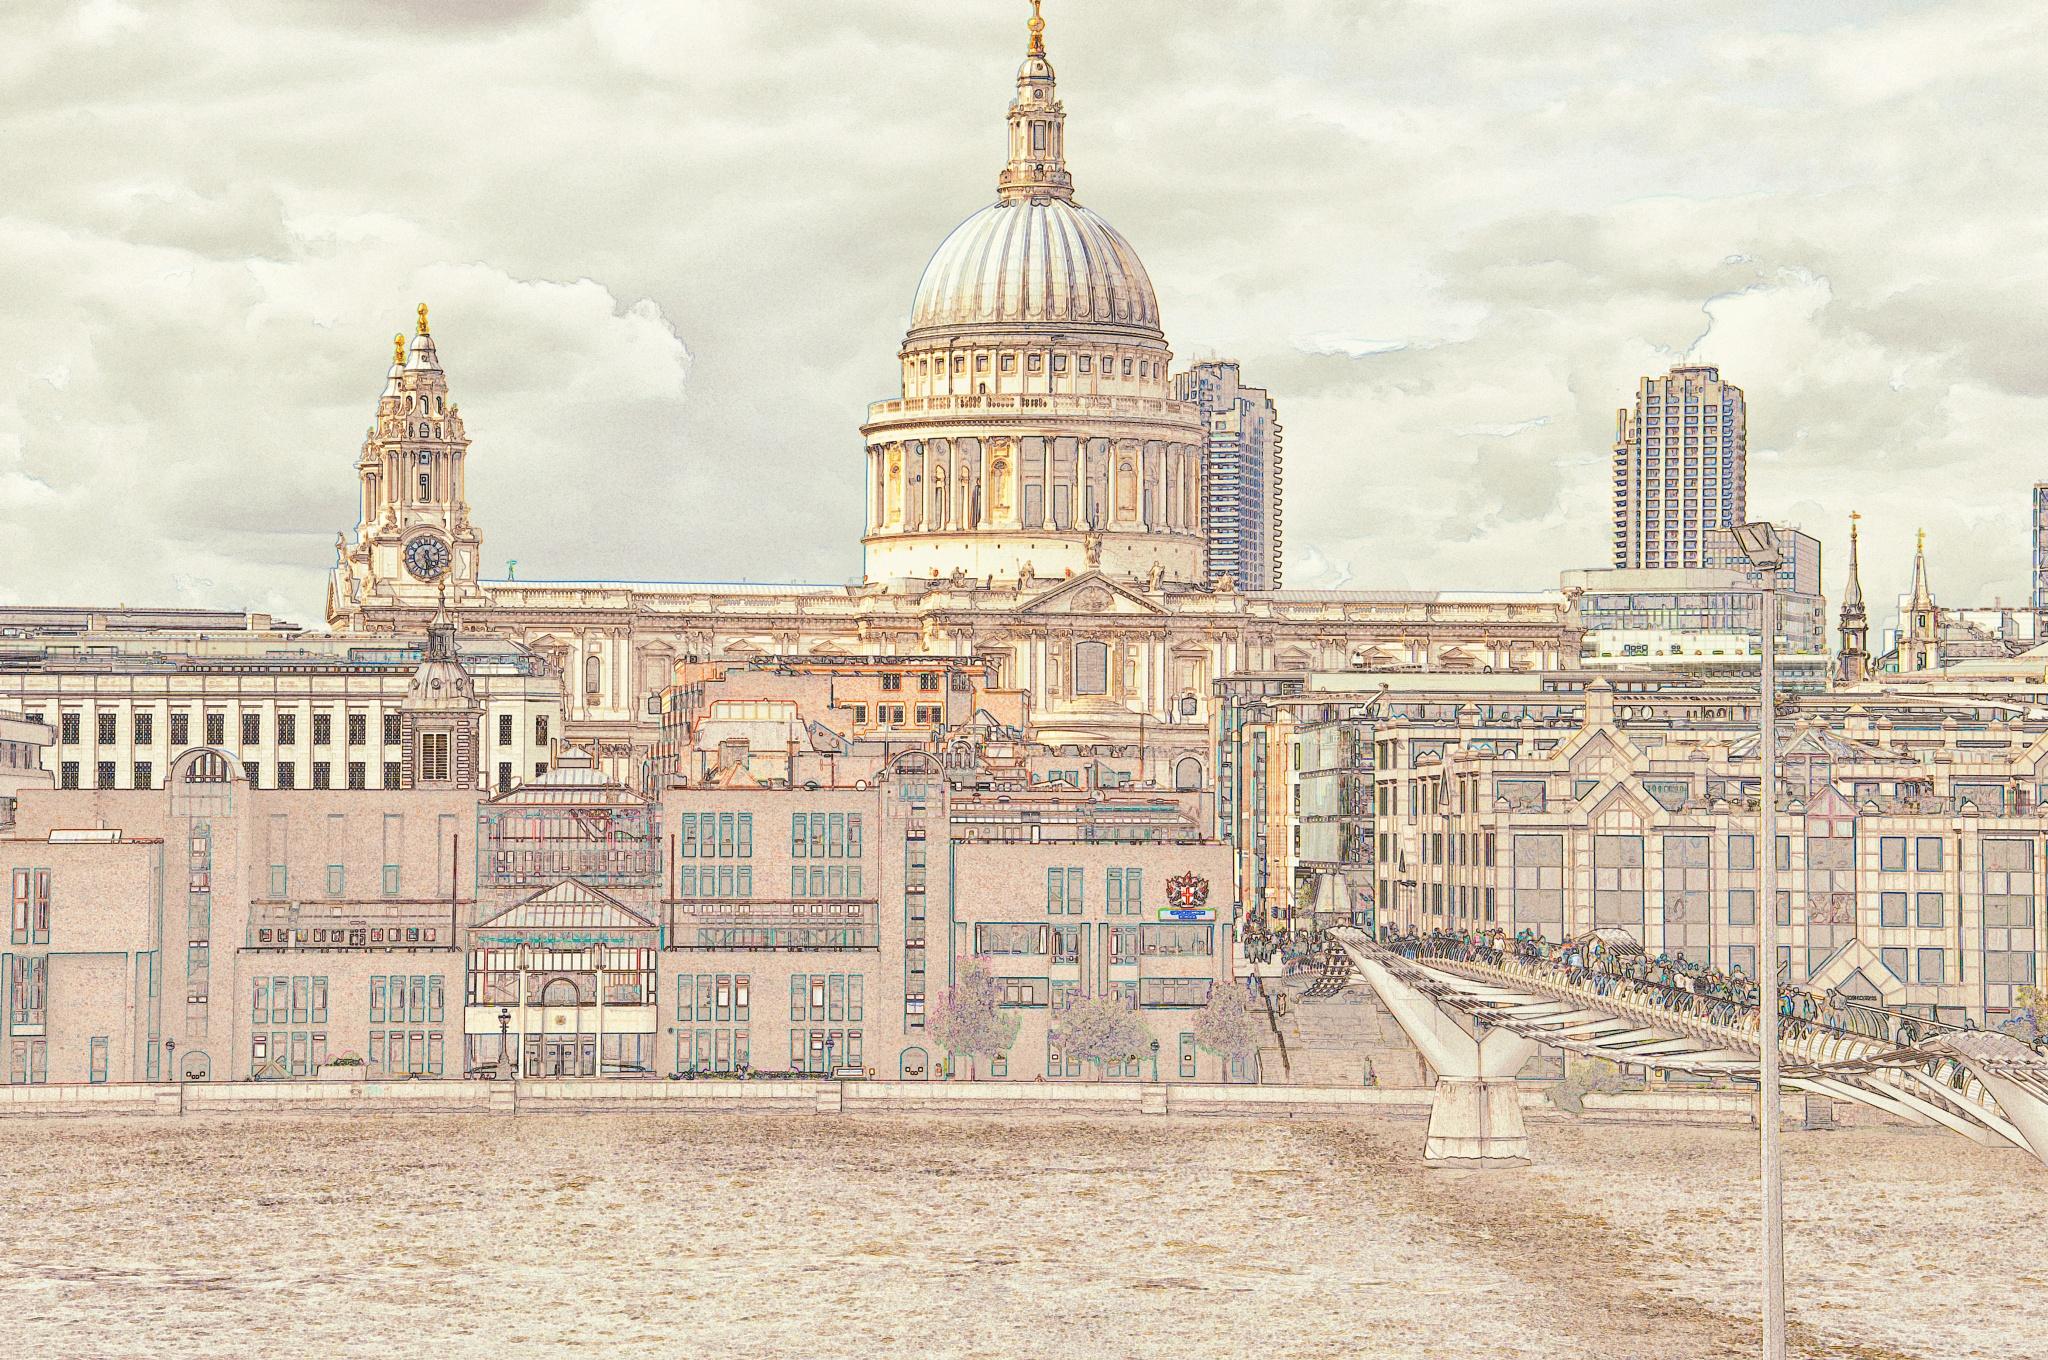 St Pauls & the Millenium Bridge by Jim Obee